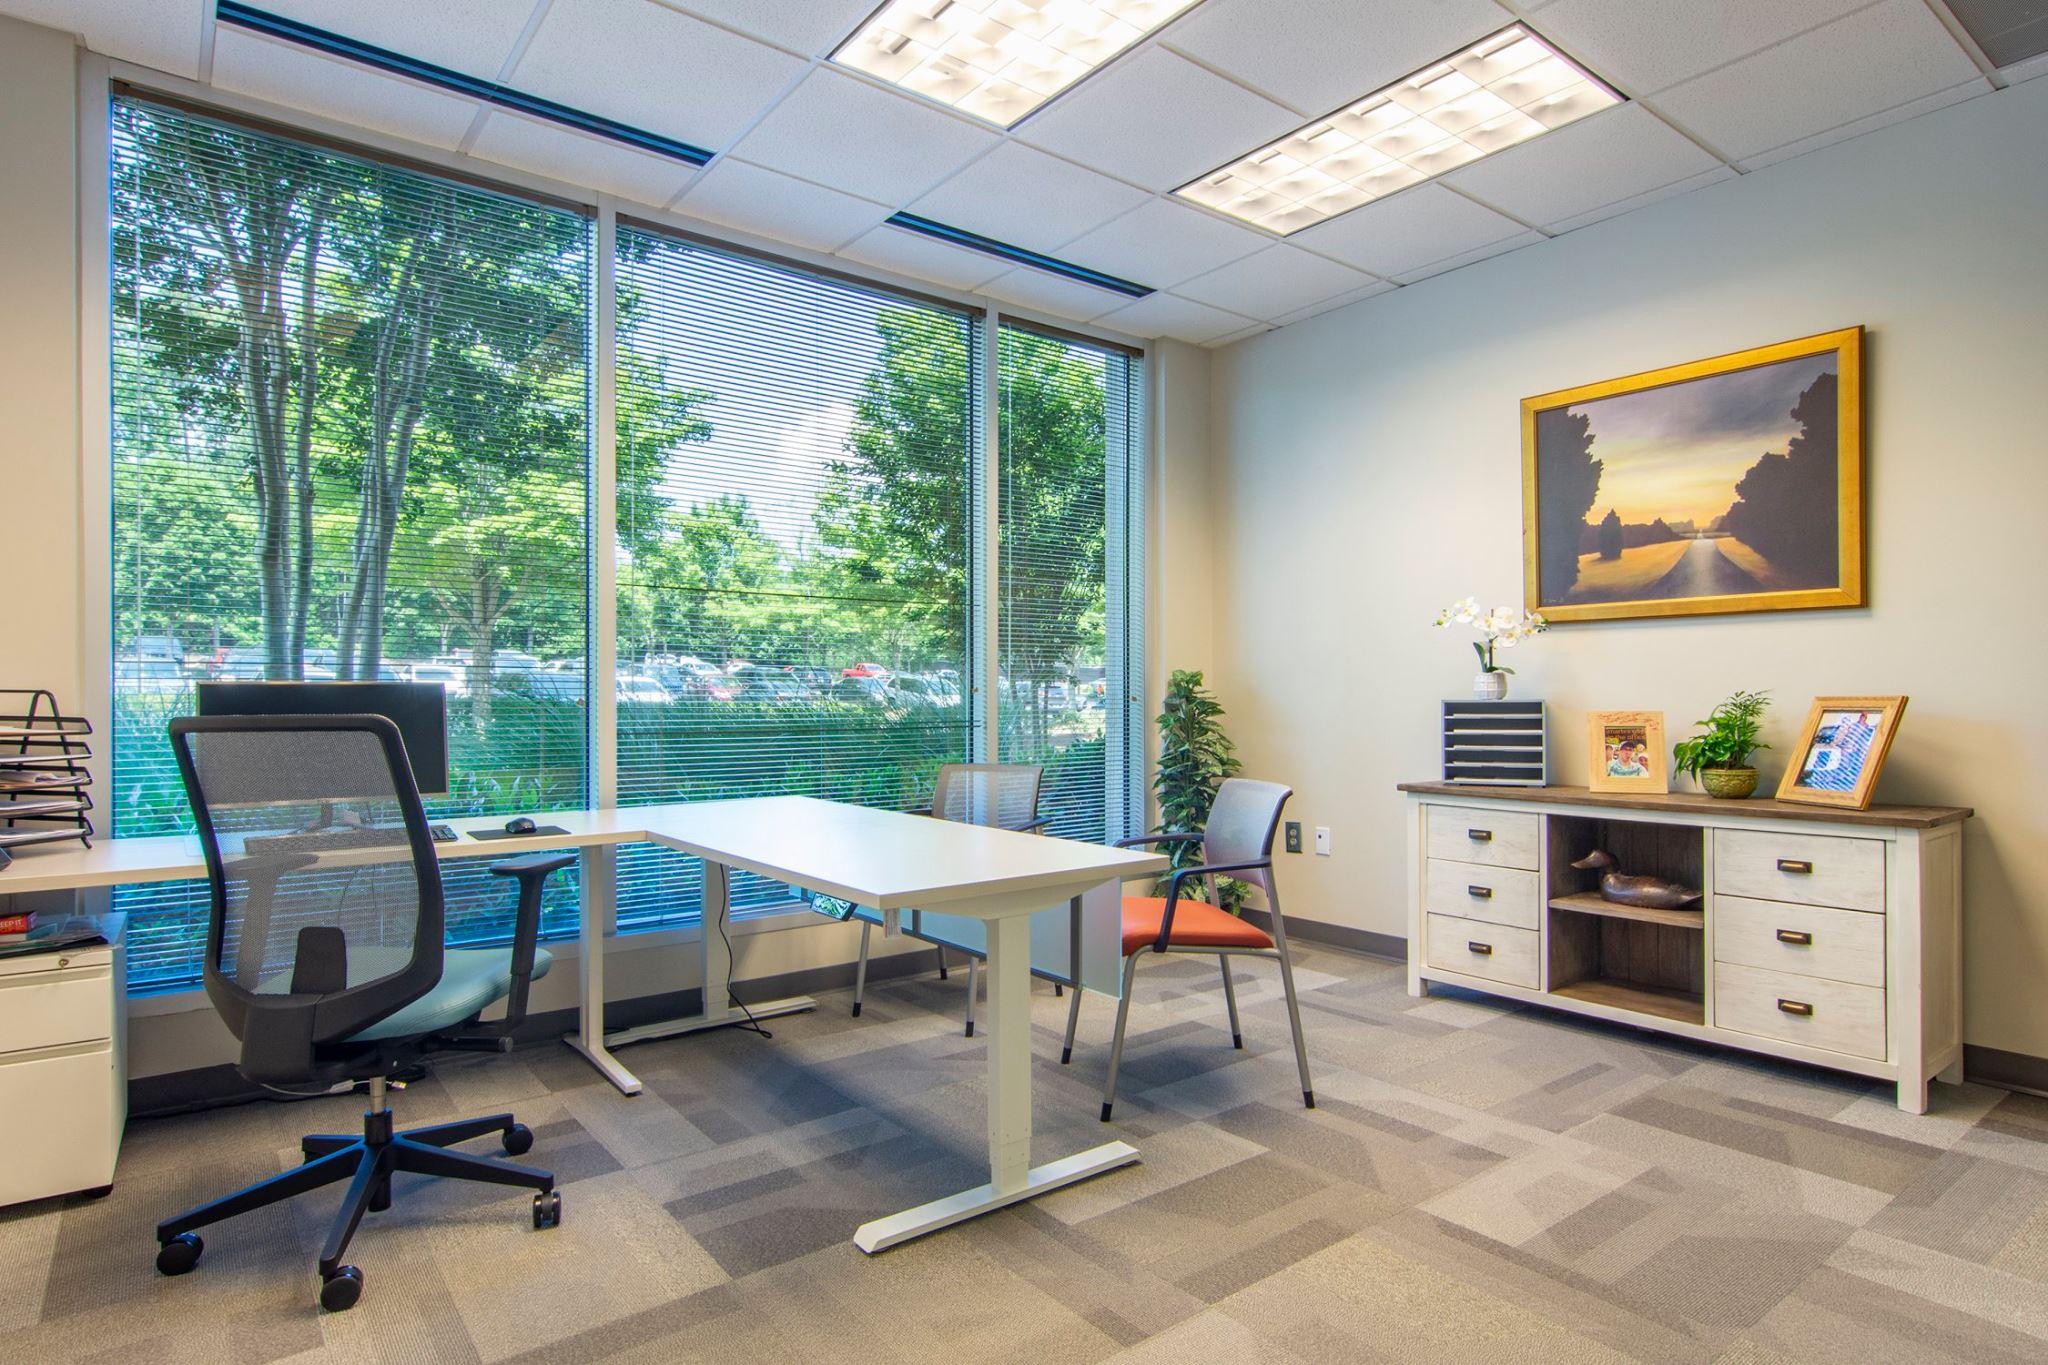 Office Evolution - Alpharetta, GA reviews   Shared Office Spaces at 11720 Amber Park Dr #160 - Alpharetta GA